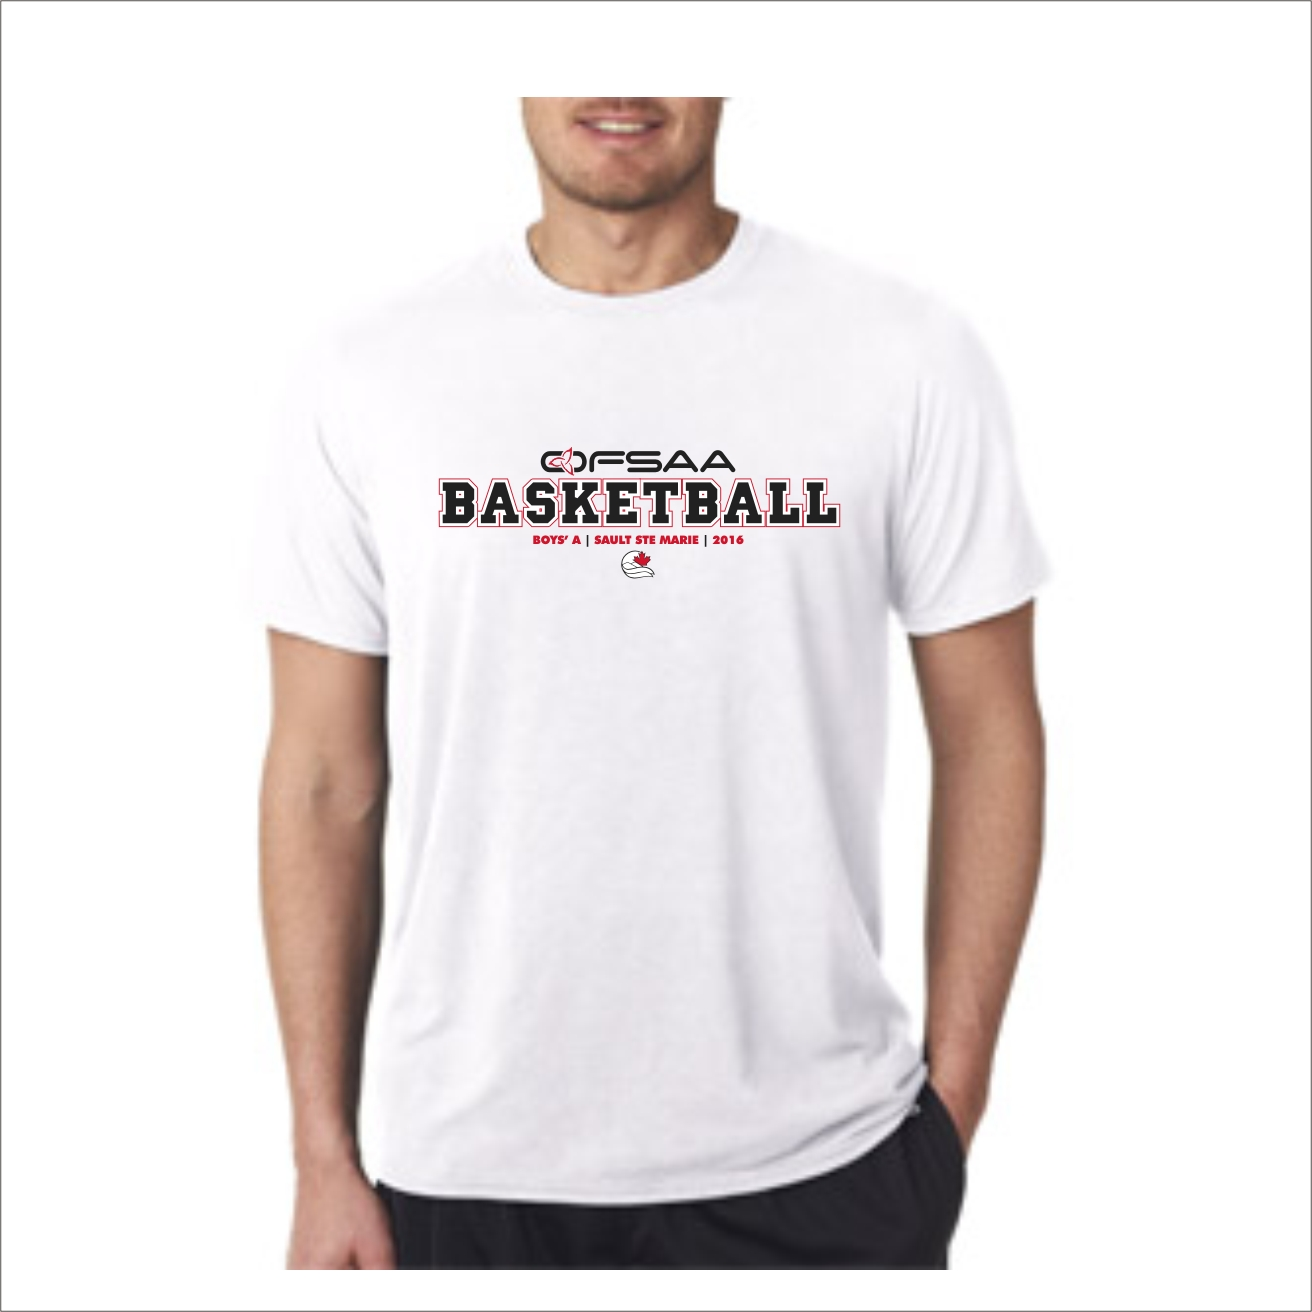 2016 Boys A Basketball Tshirt single.jpg